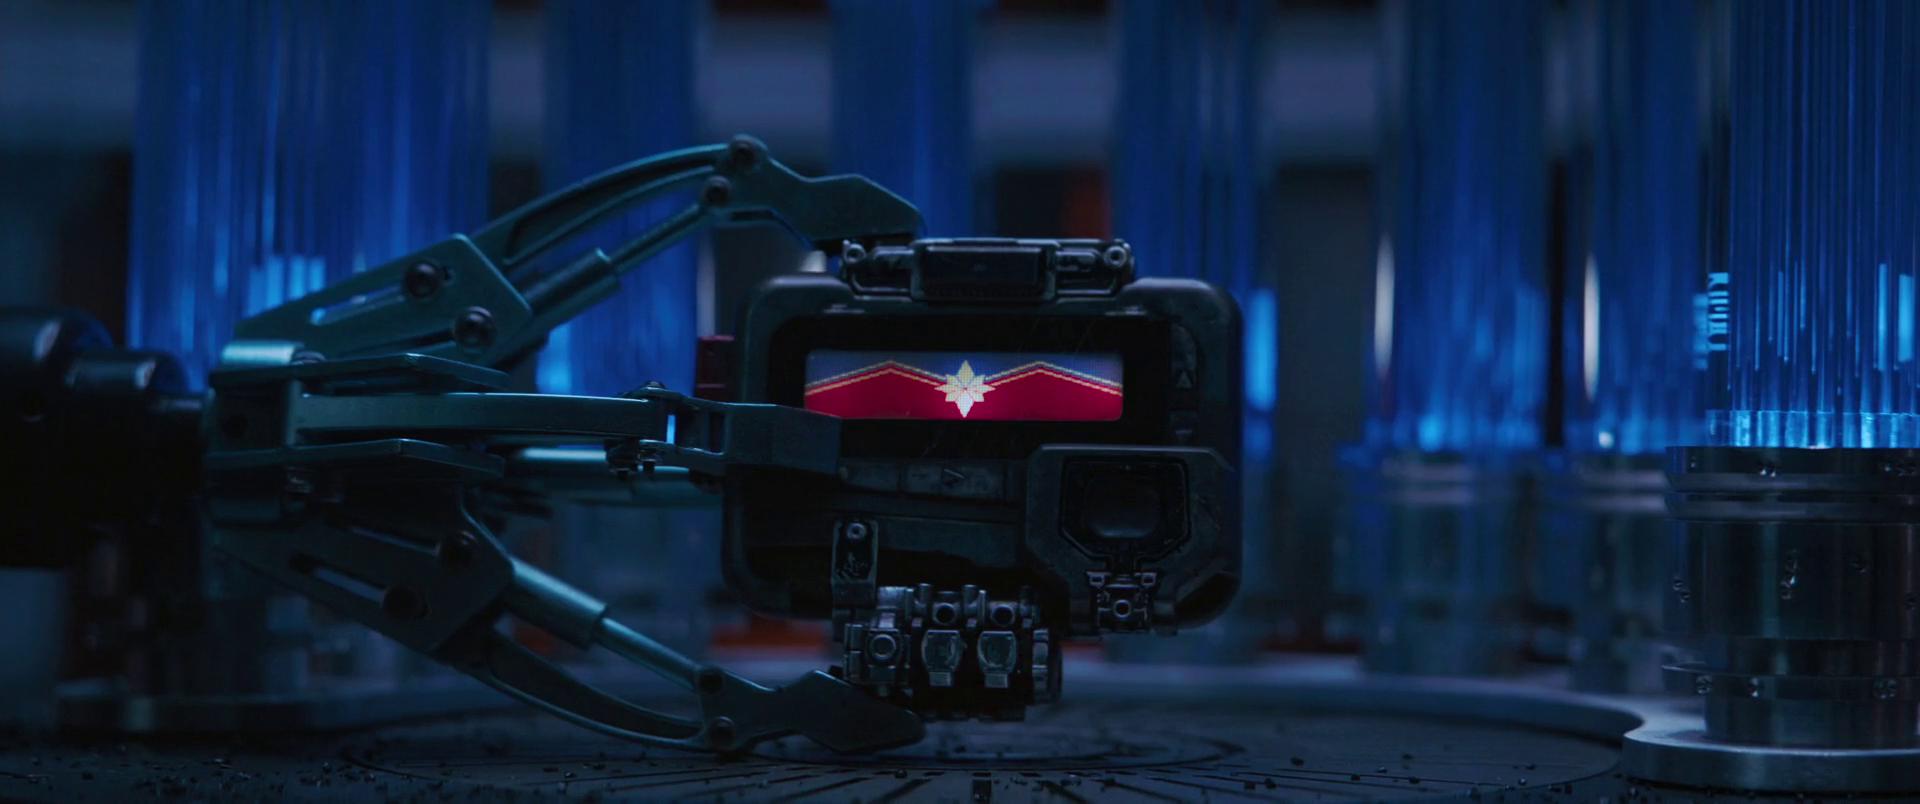 Transmitter Pager | Marvel Cinematic Universe Wiki | Fandom